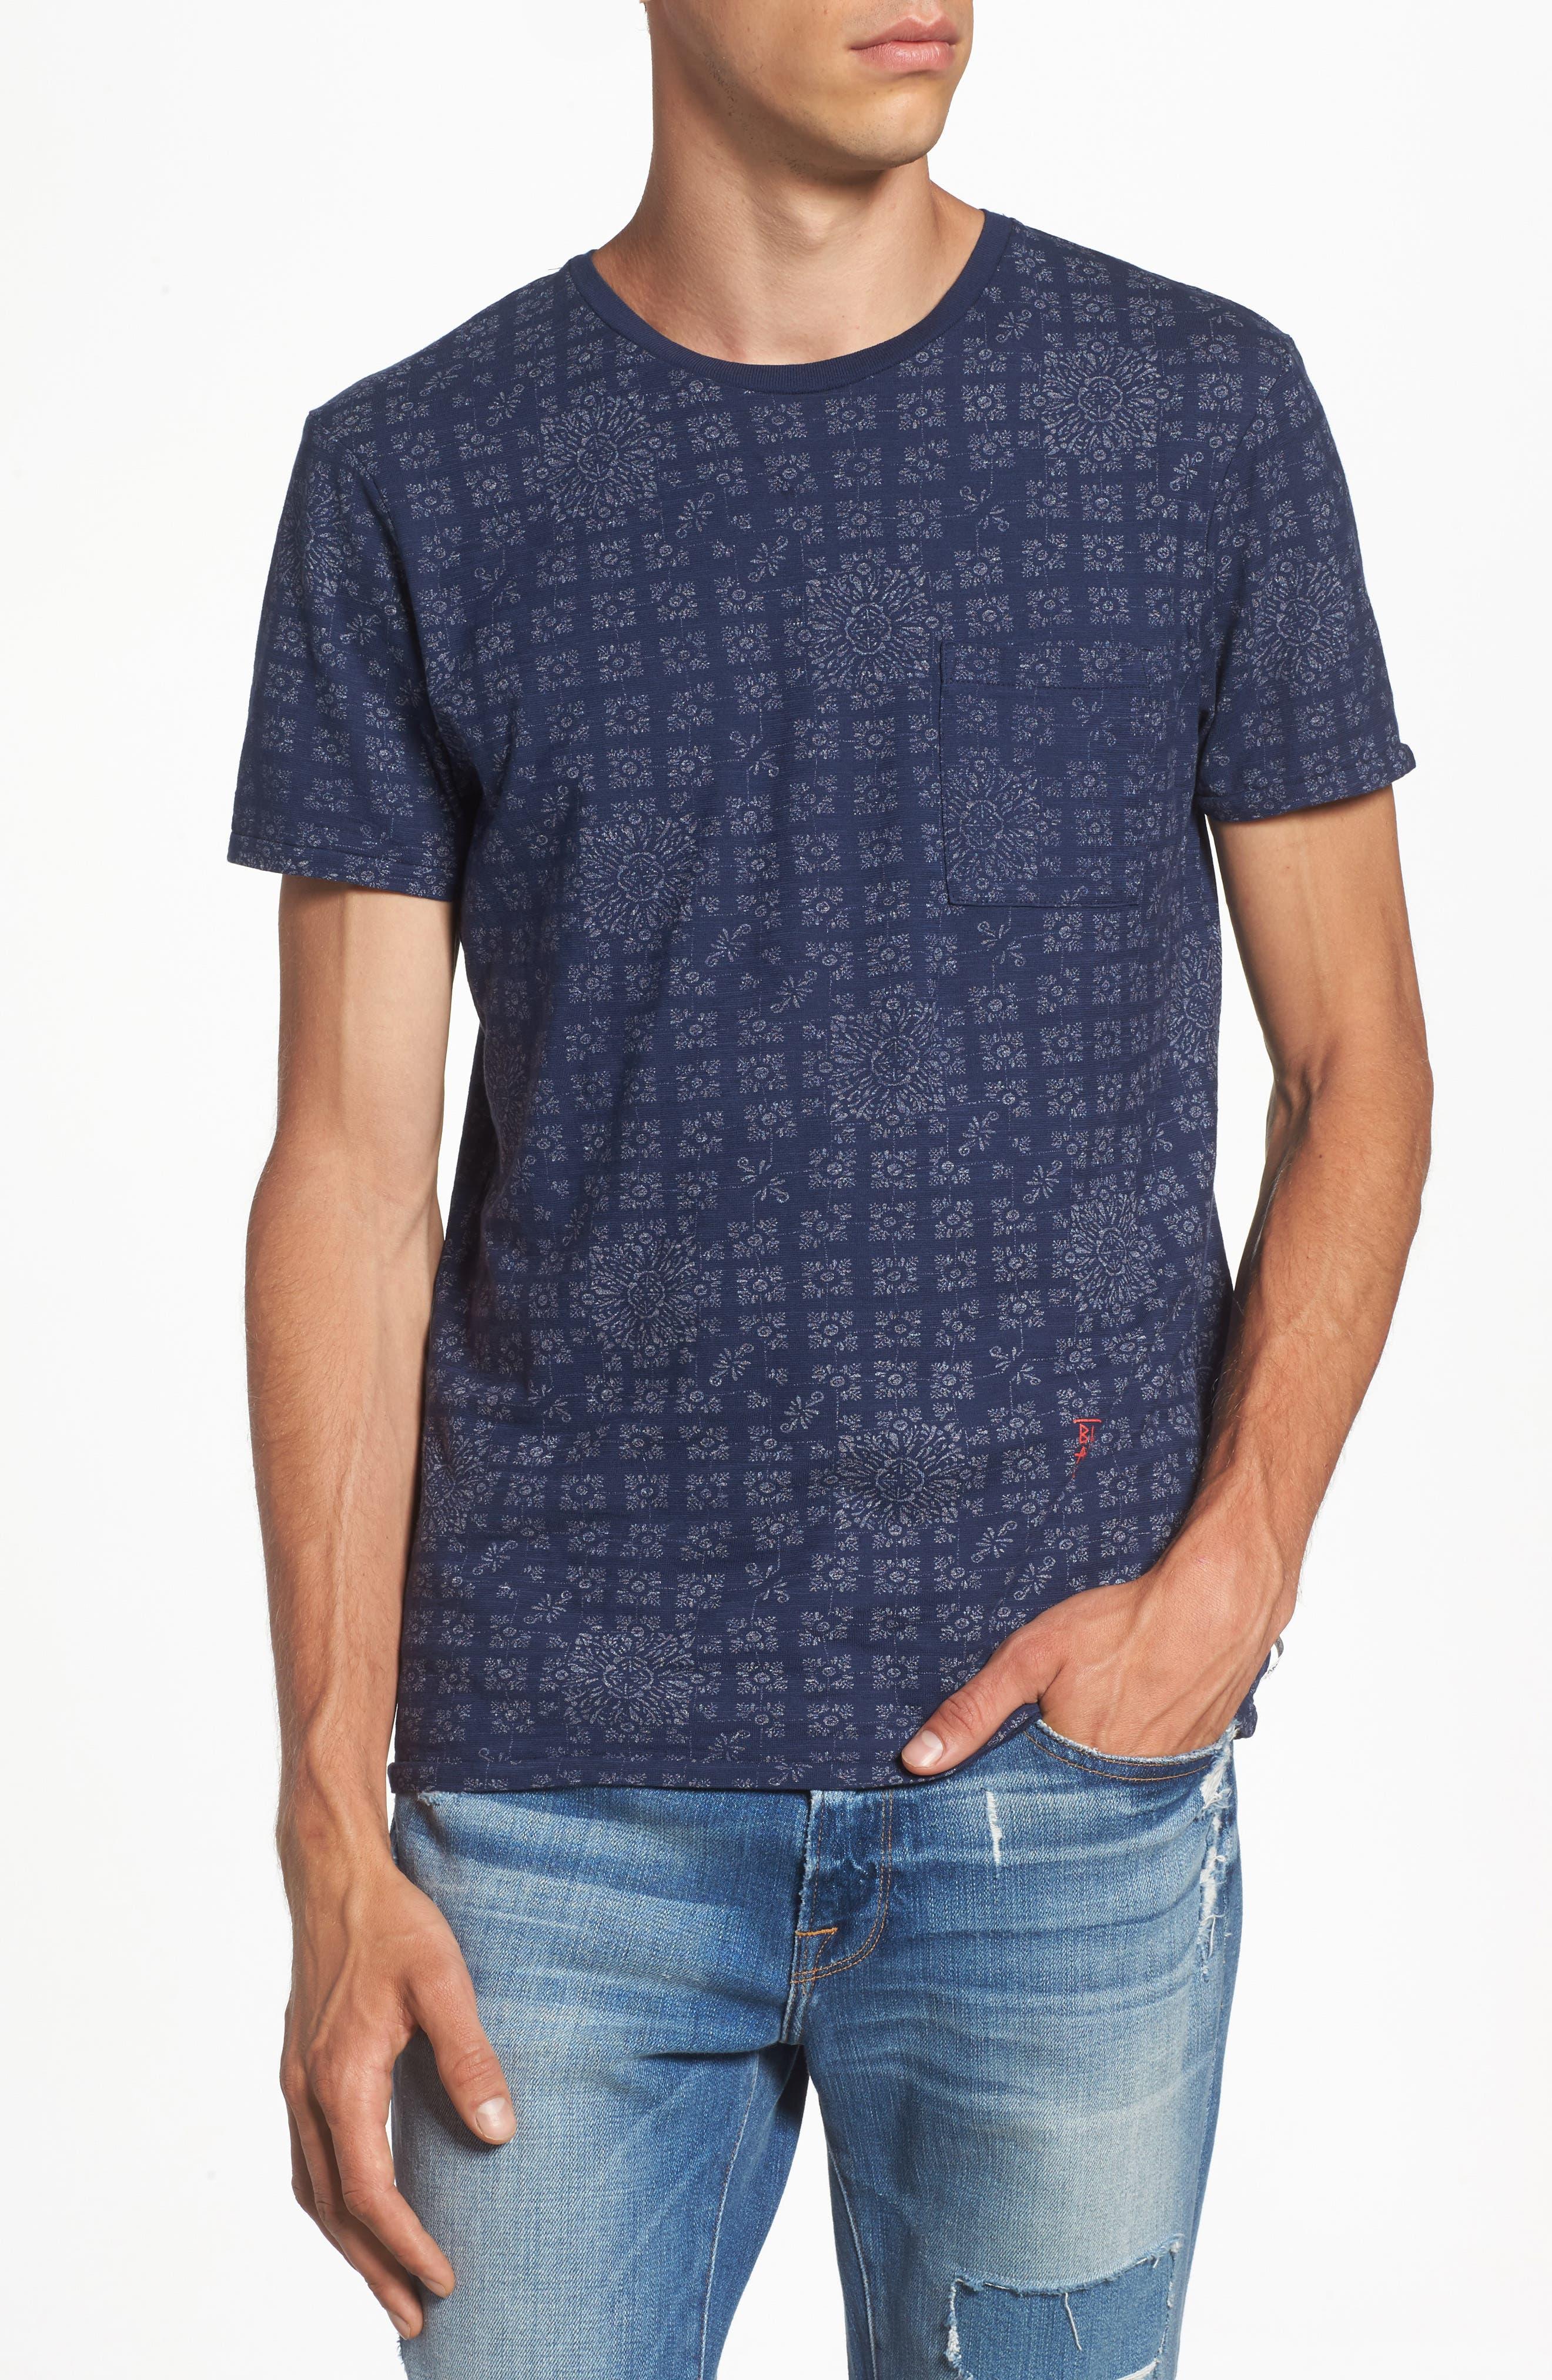 AMS Graphic T-Shirt,                         Main,                         color, 410